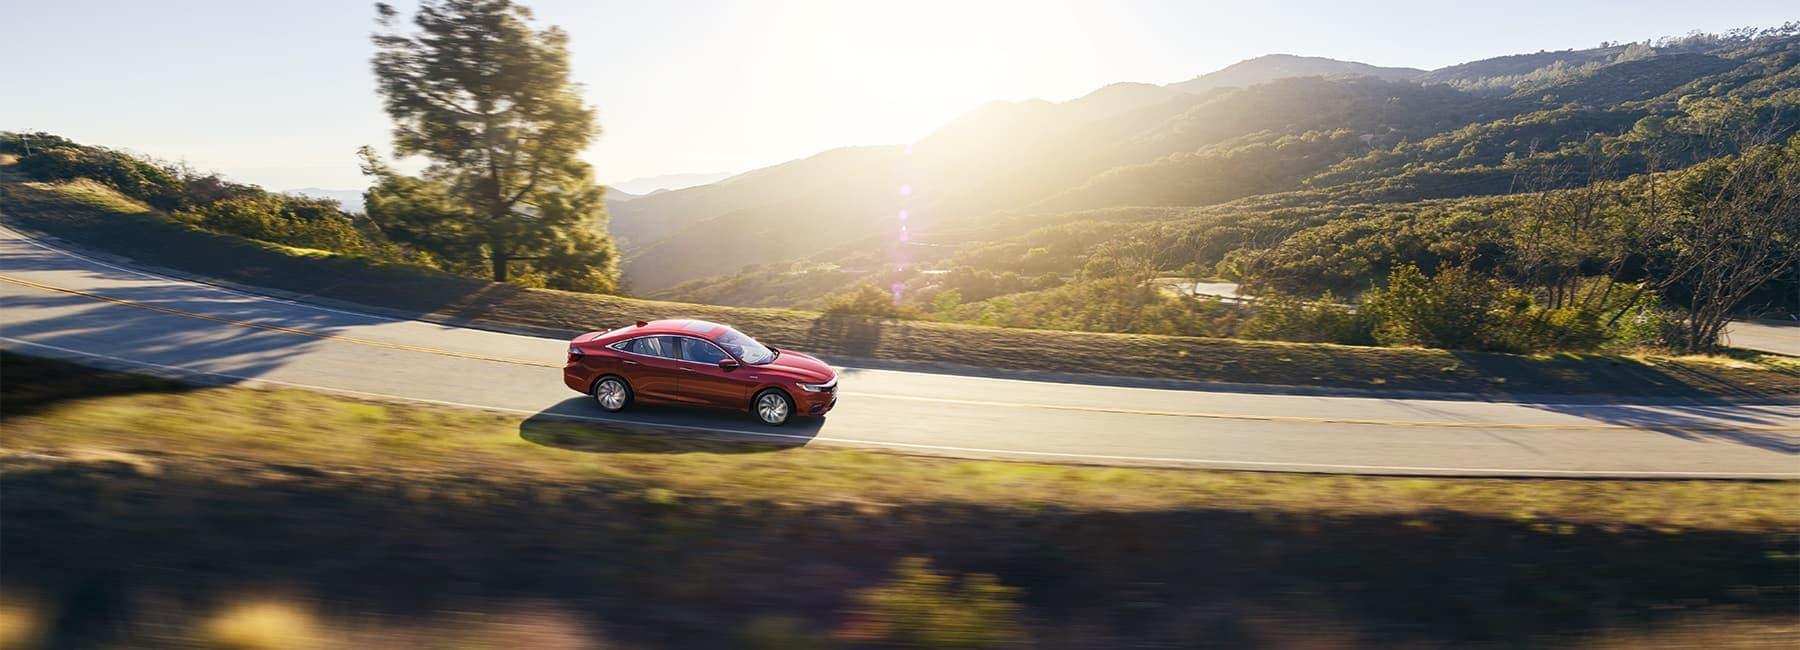 2020 Honda Clarity side View